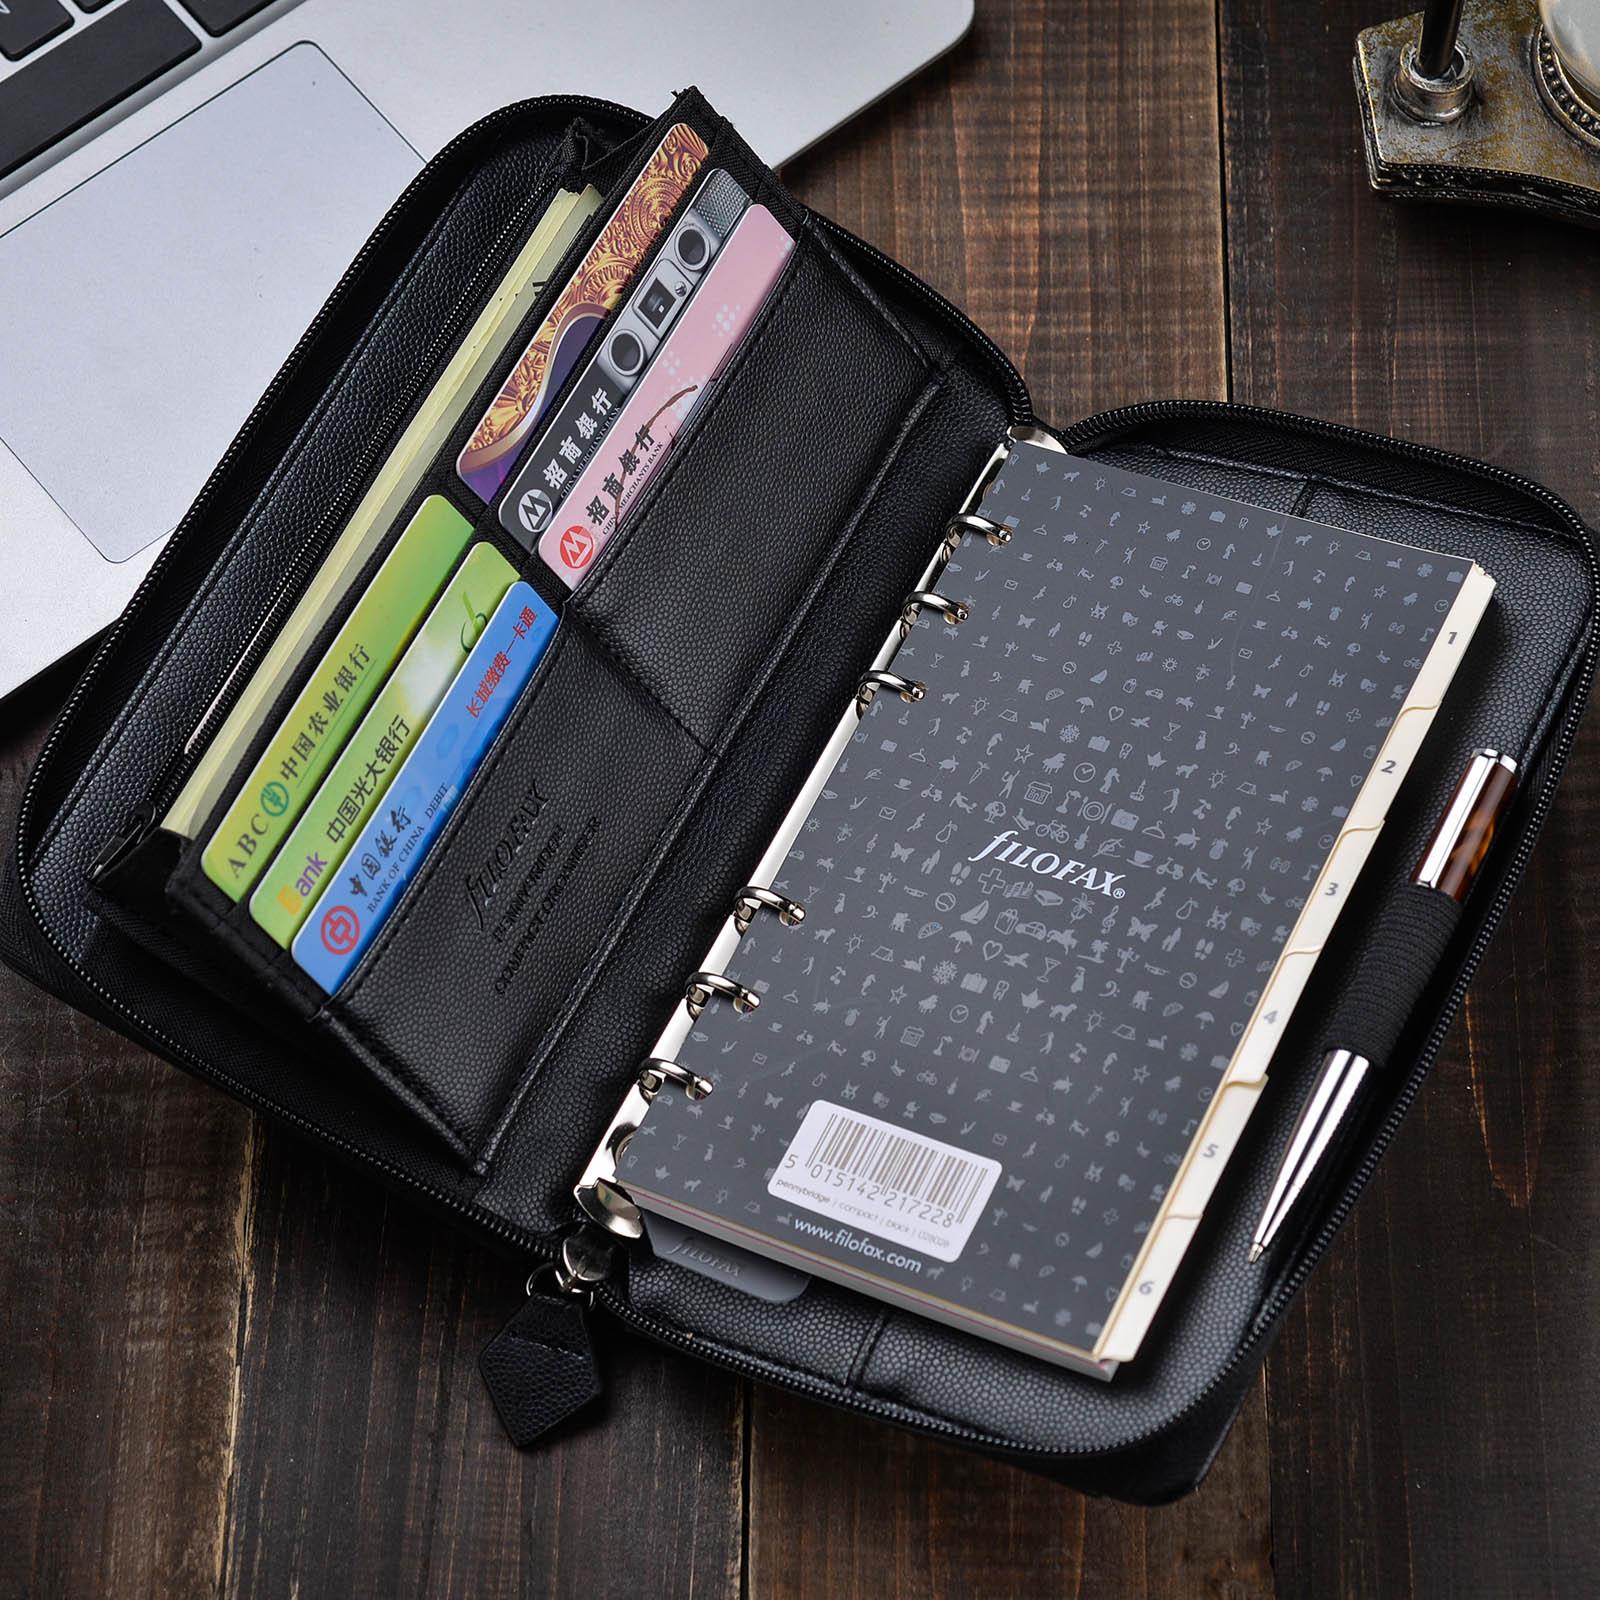 Filofax compact Zip A6 拉链包 活页本笔记本记事本 手包 钱包